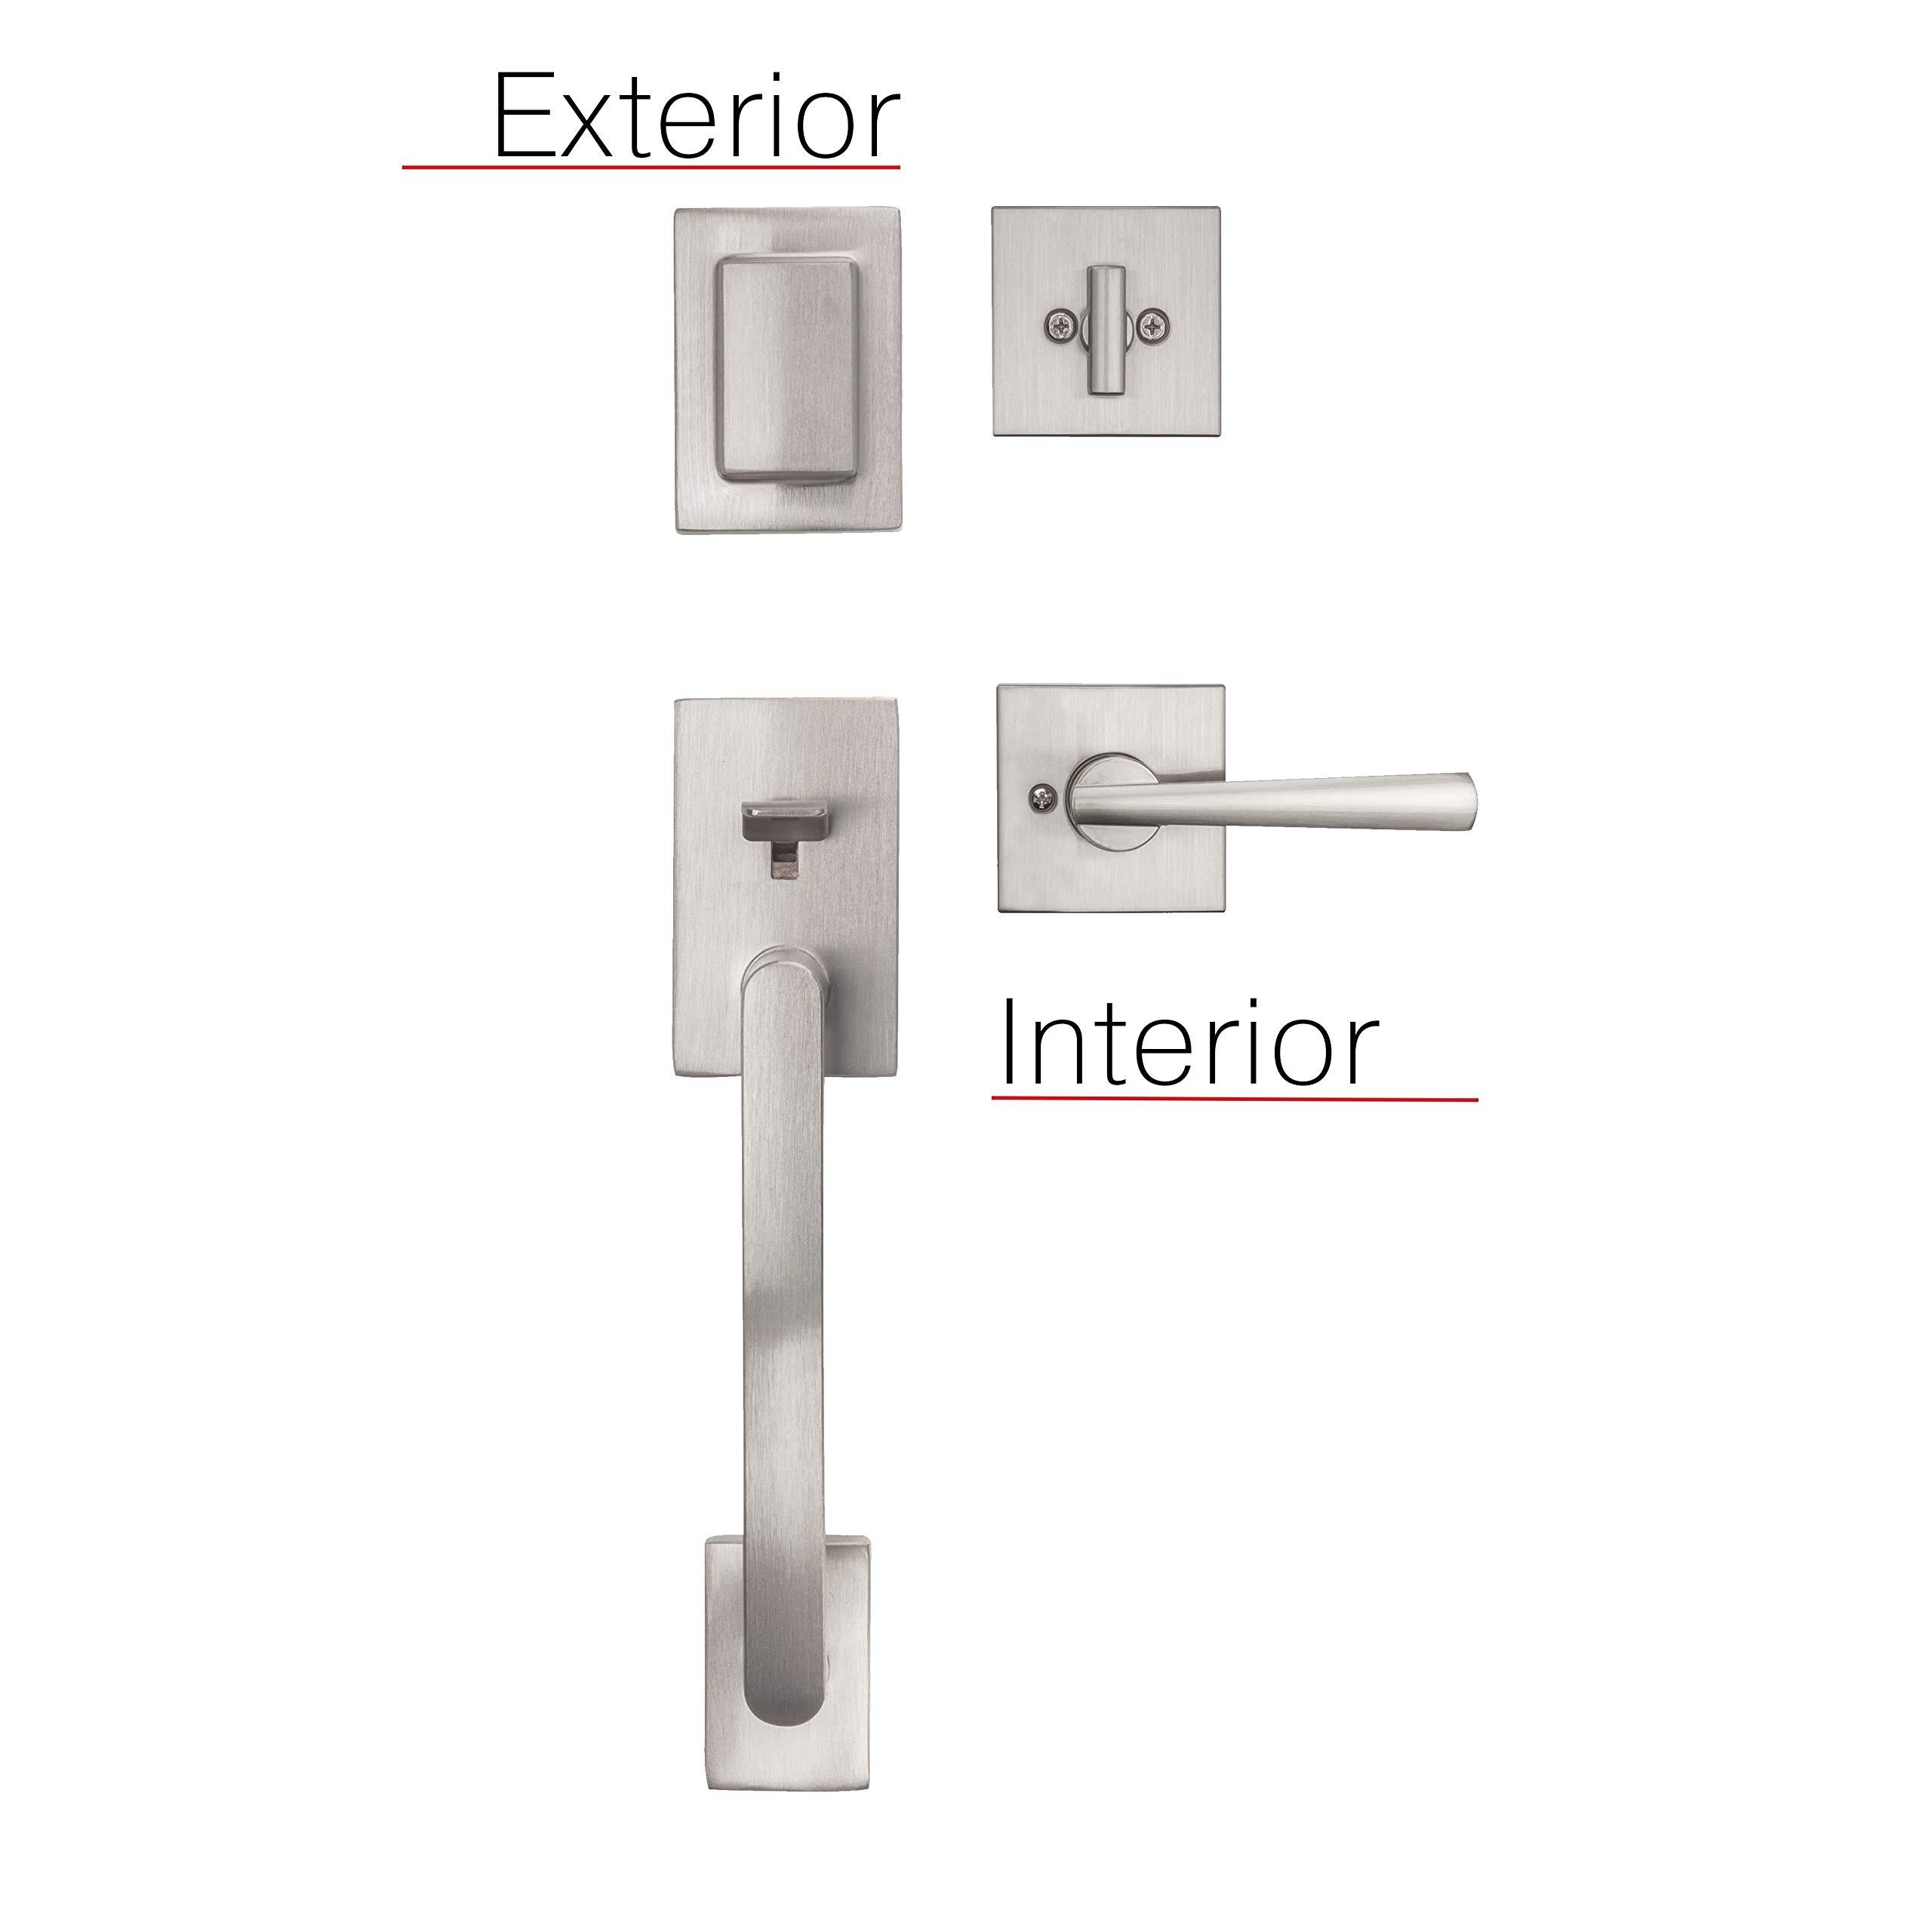 Baldwin Prestige Spyglass Single Cylinder Handle Set with Spyglass Lever Featuring Smart Key in Satin Nickel by Baldwin (Image #6)